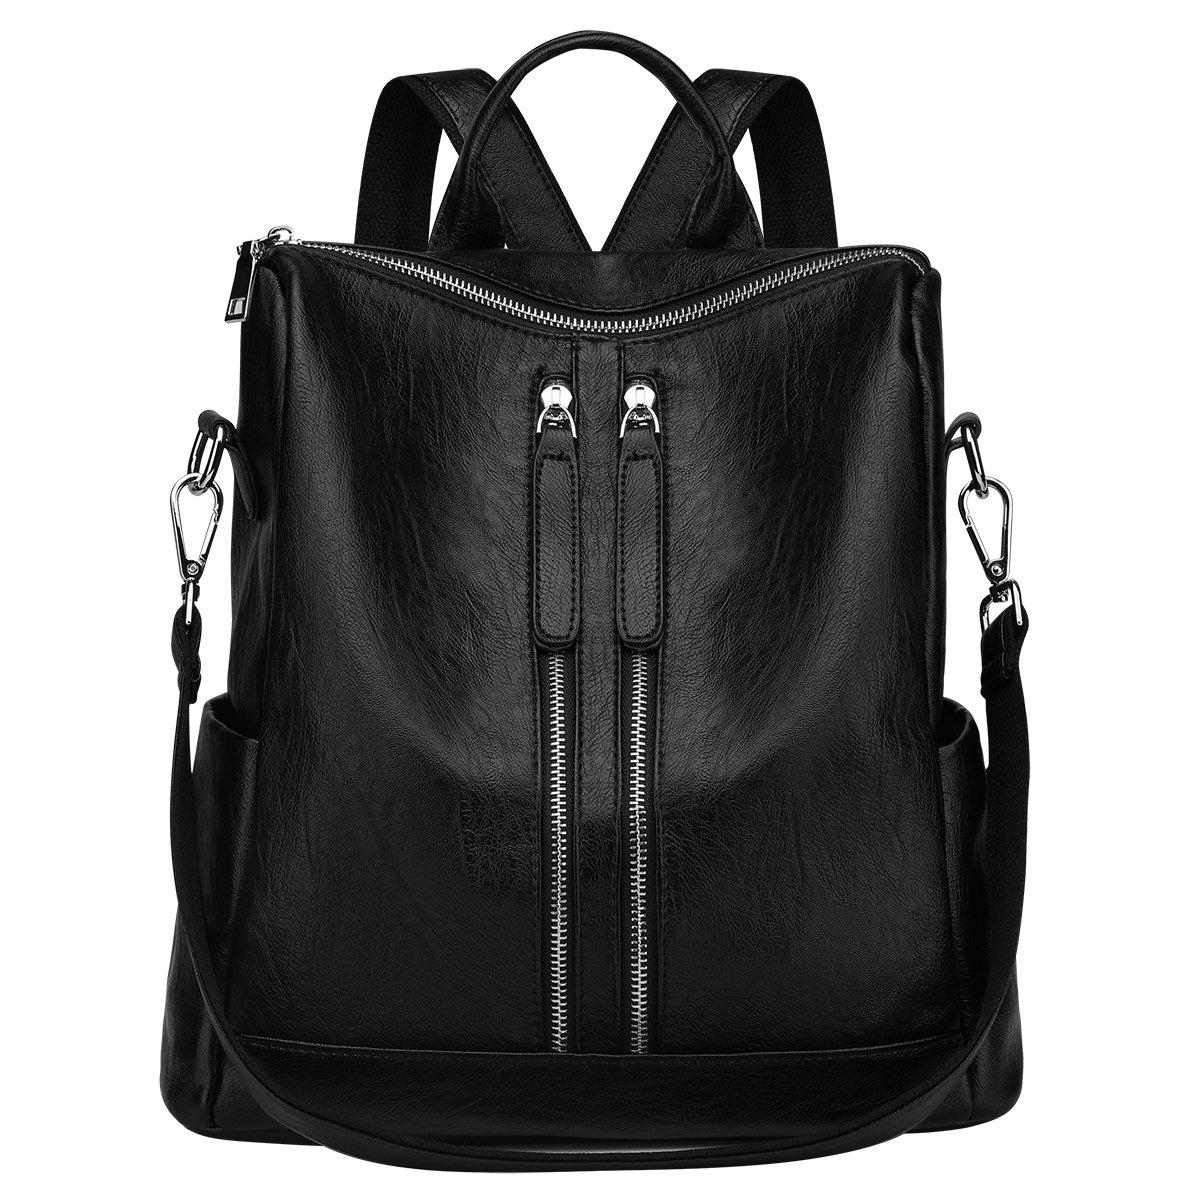 SAMSHOWME Lightweight Women PU Leather Backpack Shoulder Bag Casual Purse by SAMSHOWME